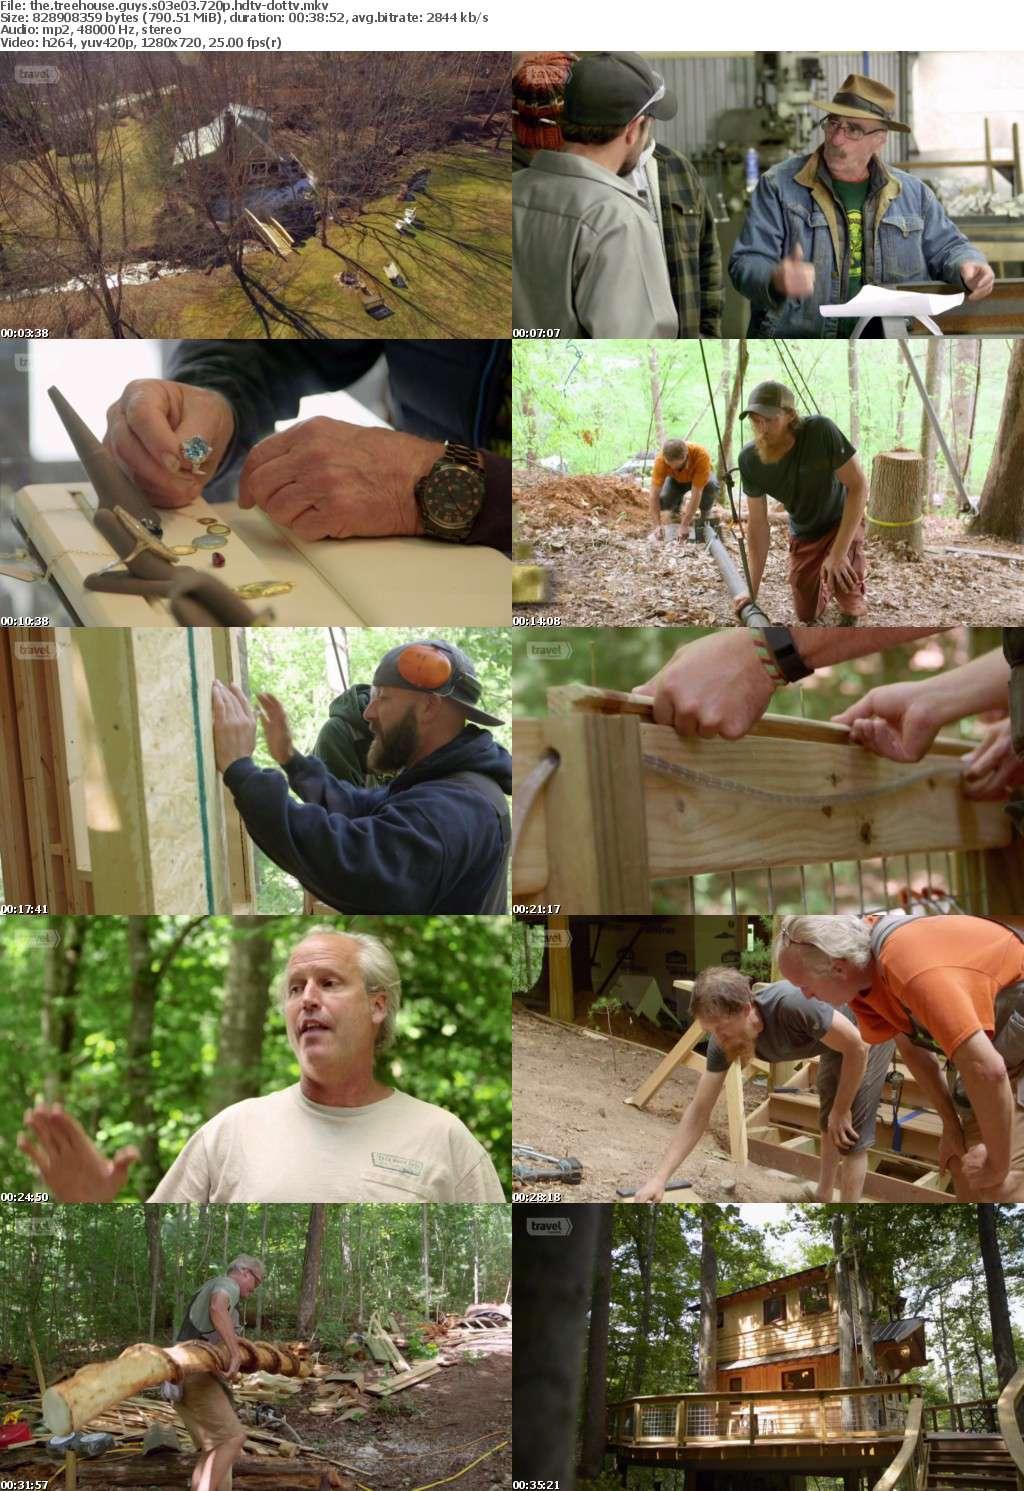 The Treehouse Guys S03E03 720p HDTV x264-dotTV